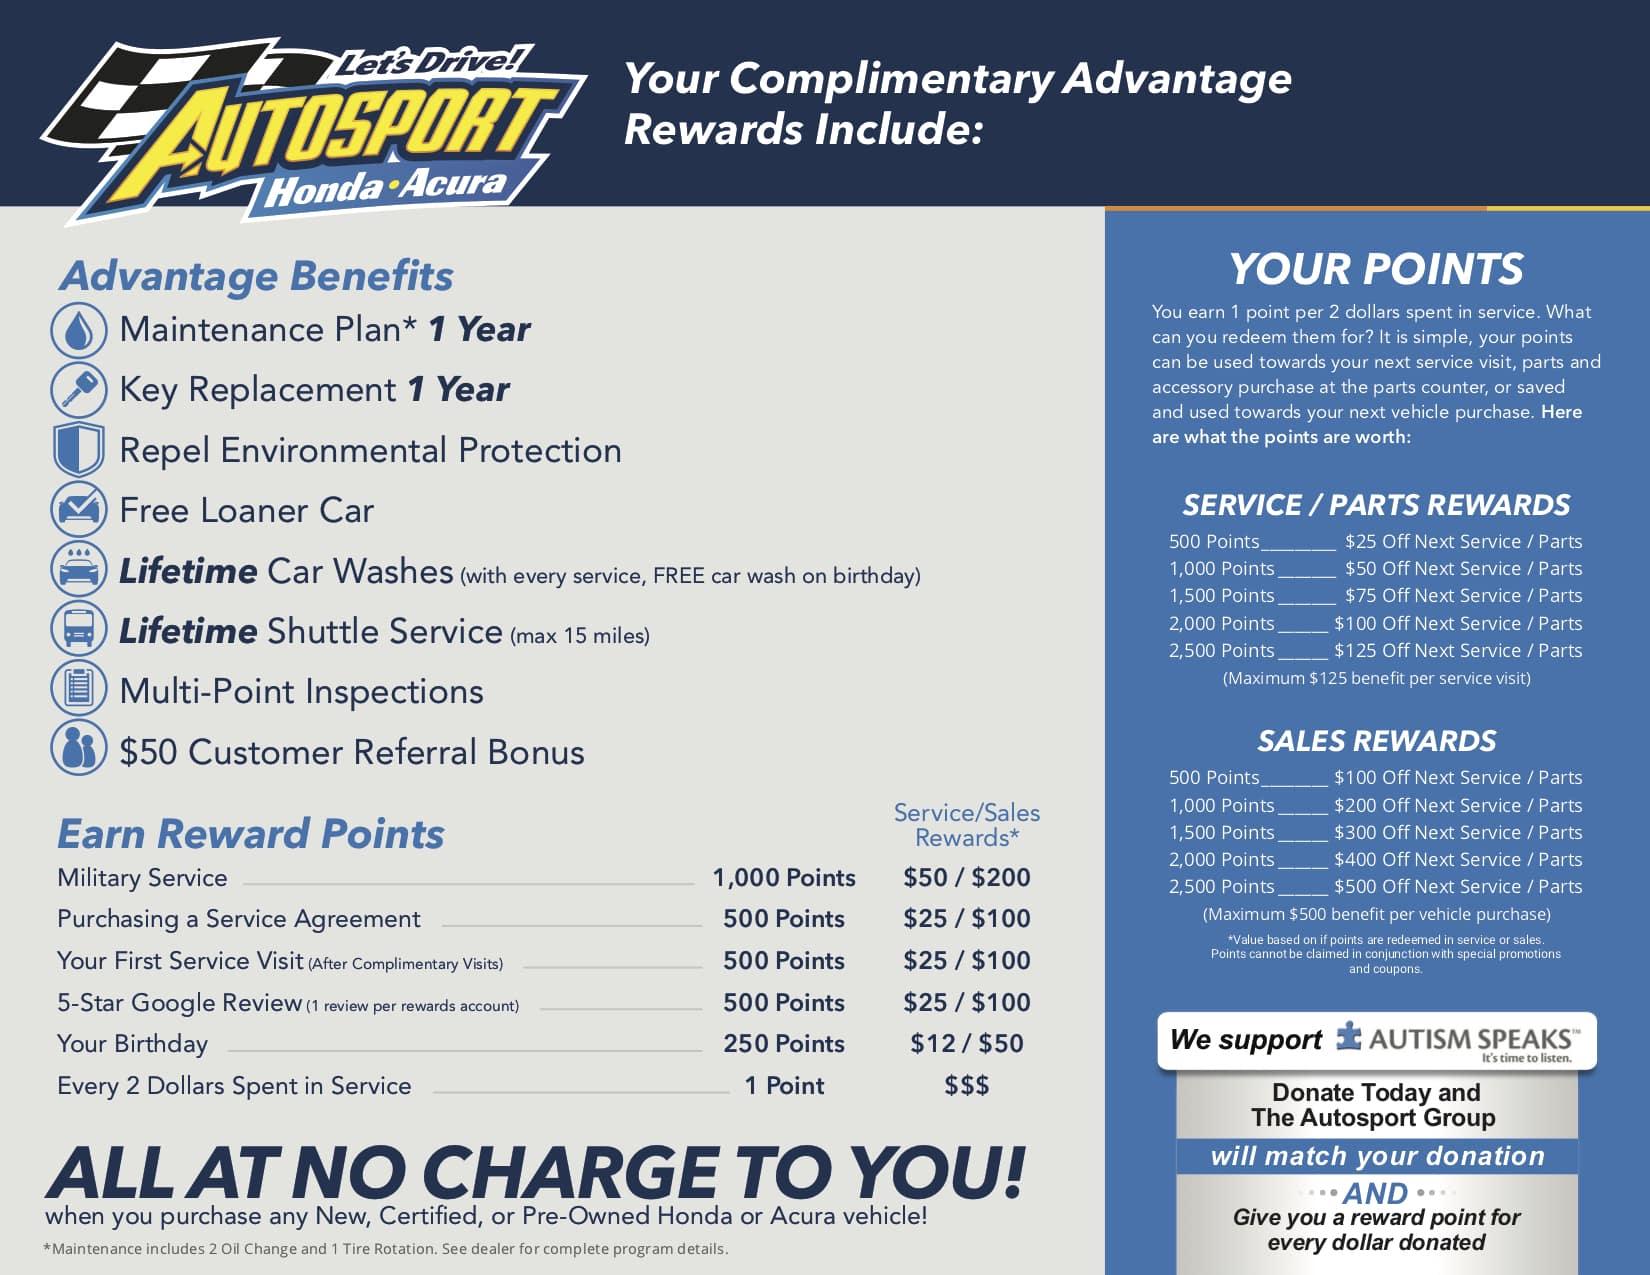 020720_Autosport_Brochure_p2